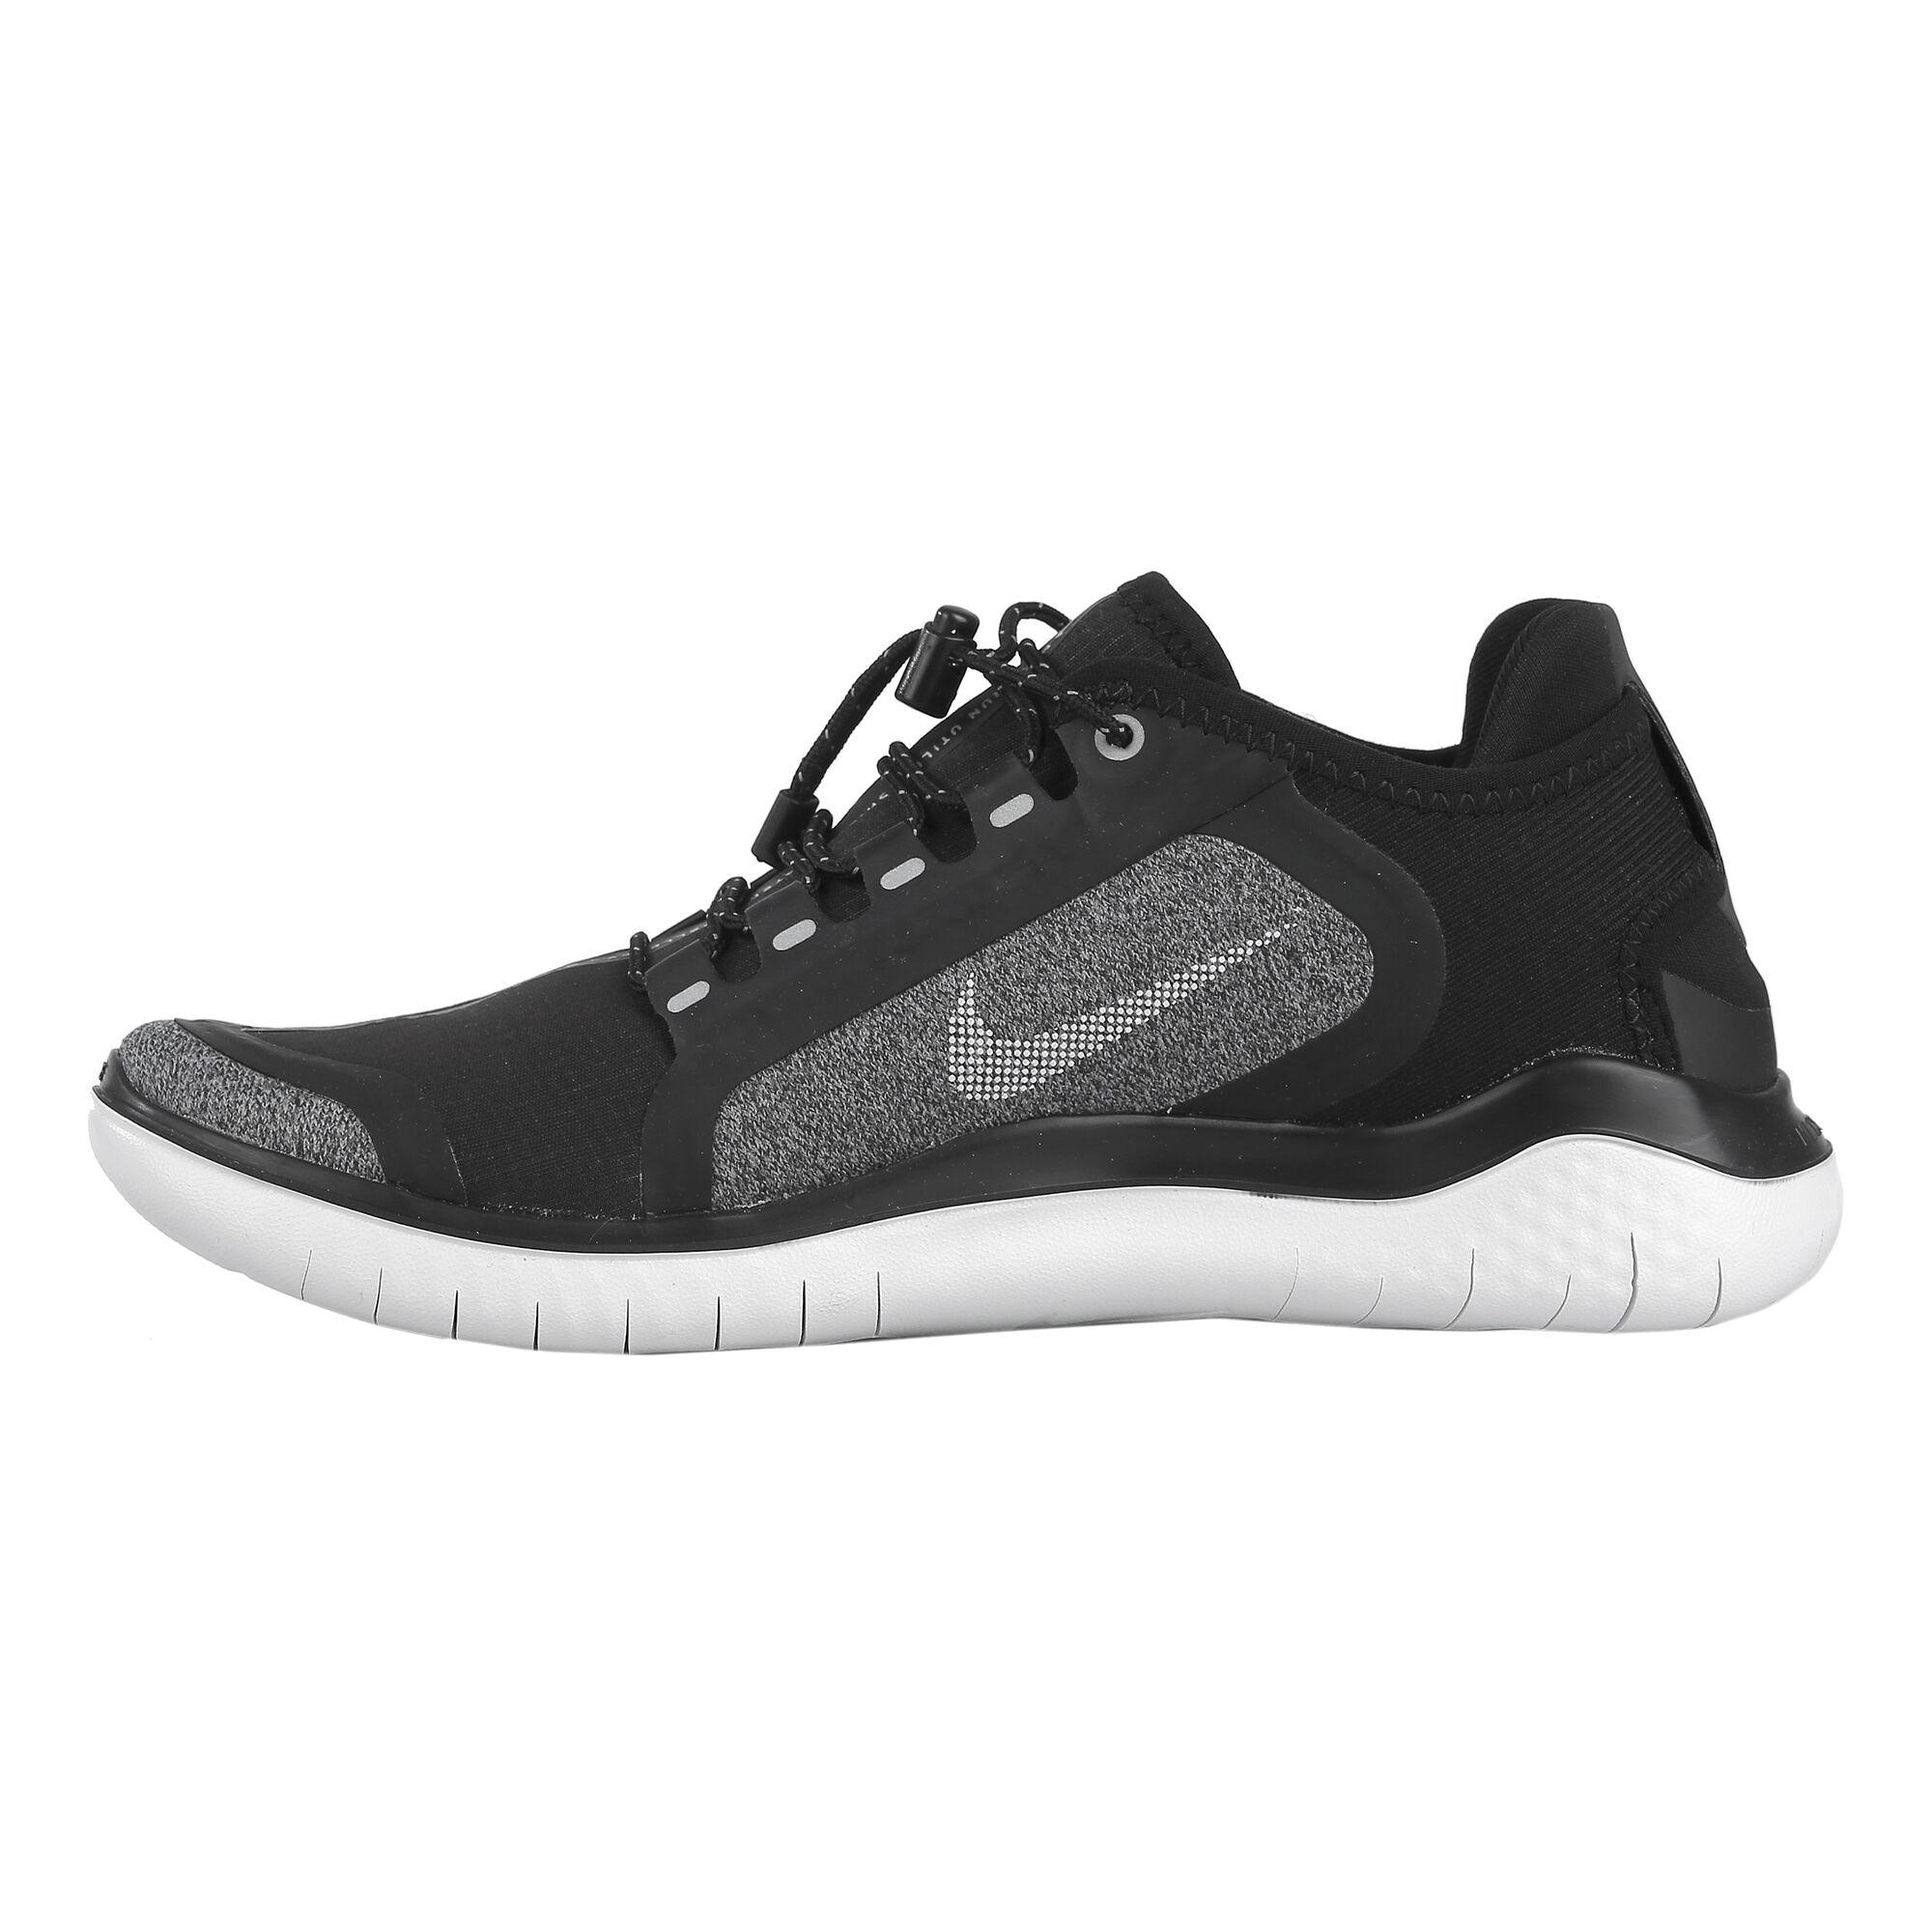 6fbd3a324d9e Nike · Nike · Nike · Nike · Nike · Nike · Nike · Nike · Nike · Nike. Free  Run 2018 Shield ...